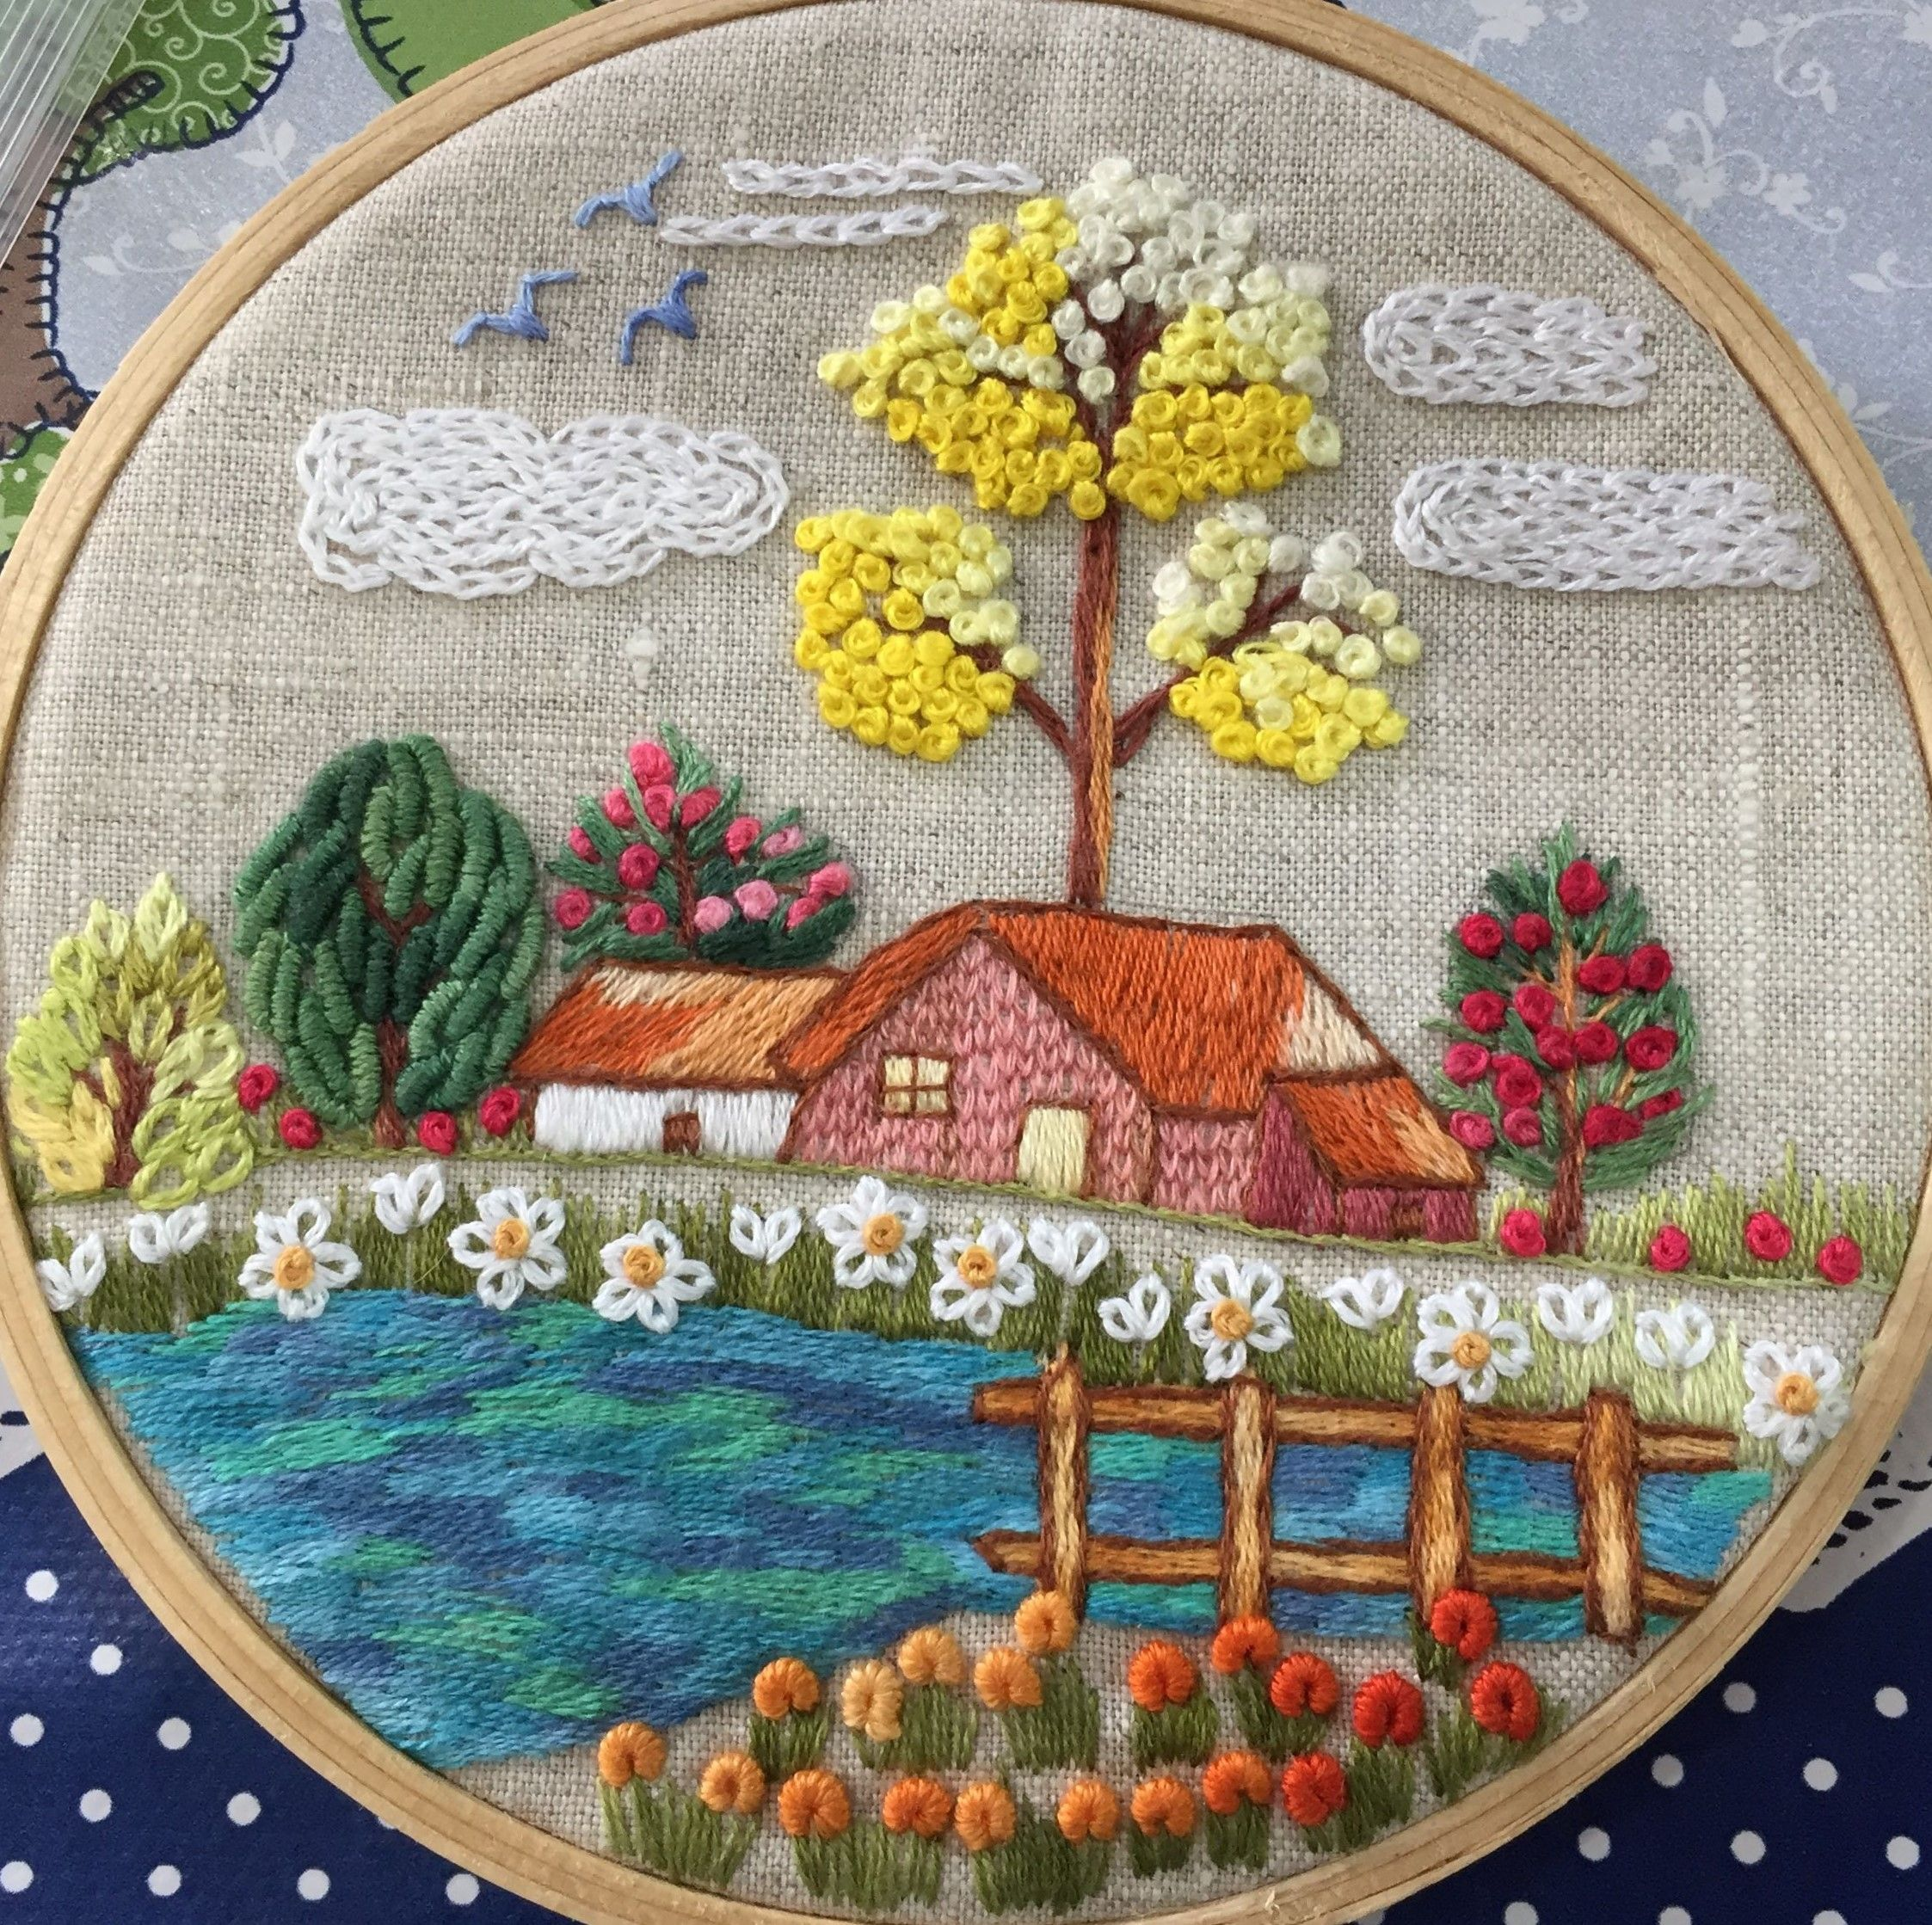 Japanese Garden Bead embrpodery kit Spring Landscape Needlepoint Handcraft Tapestry kits DIY wall decor Beaded picture cross stitch bordado